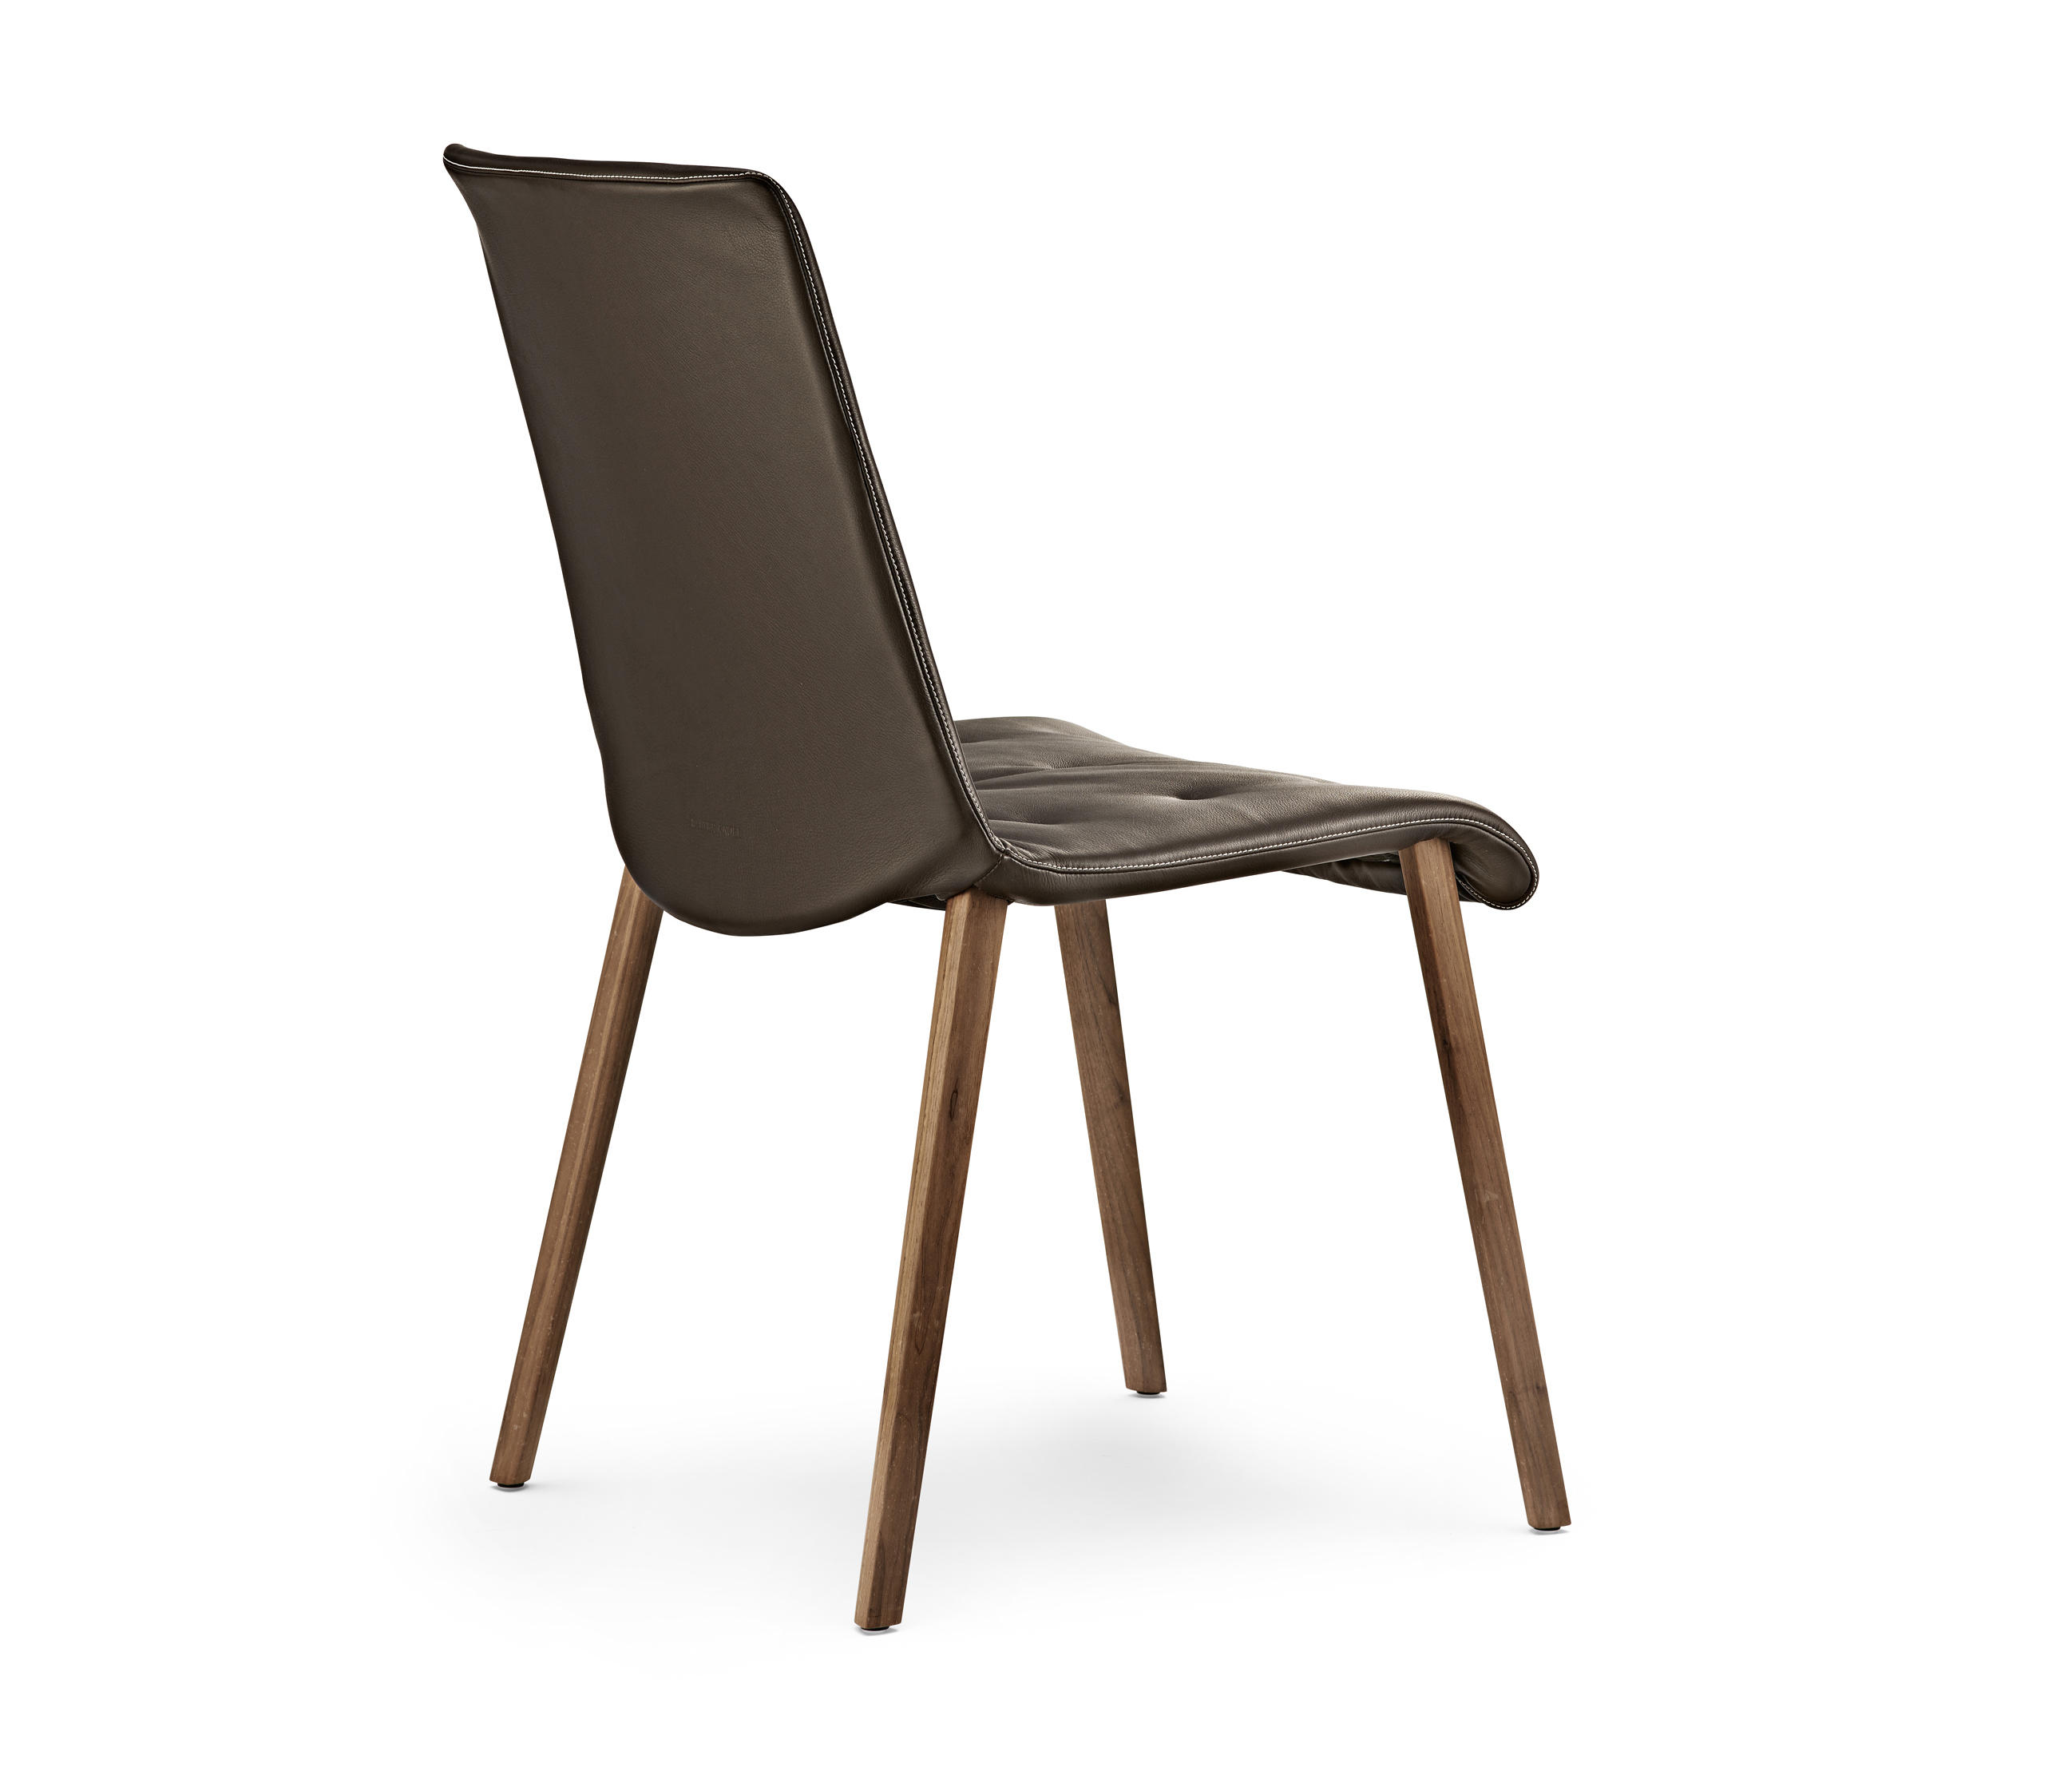 liz wood st hle von walter knoll architonic. Black Bedroom Furniture Sets. Home Design Ideas